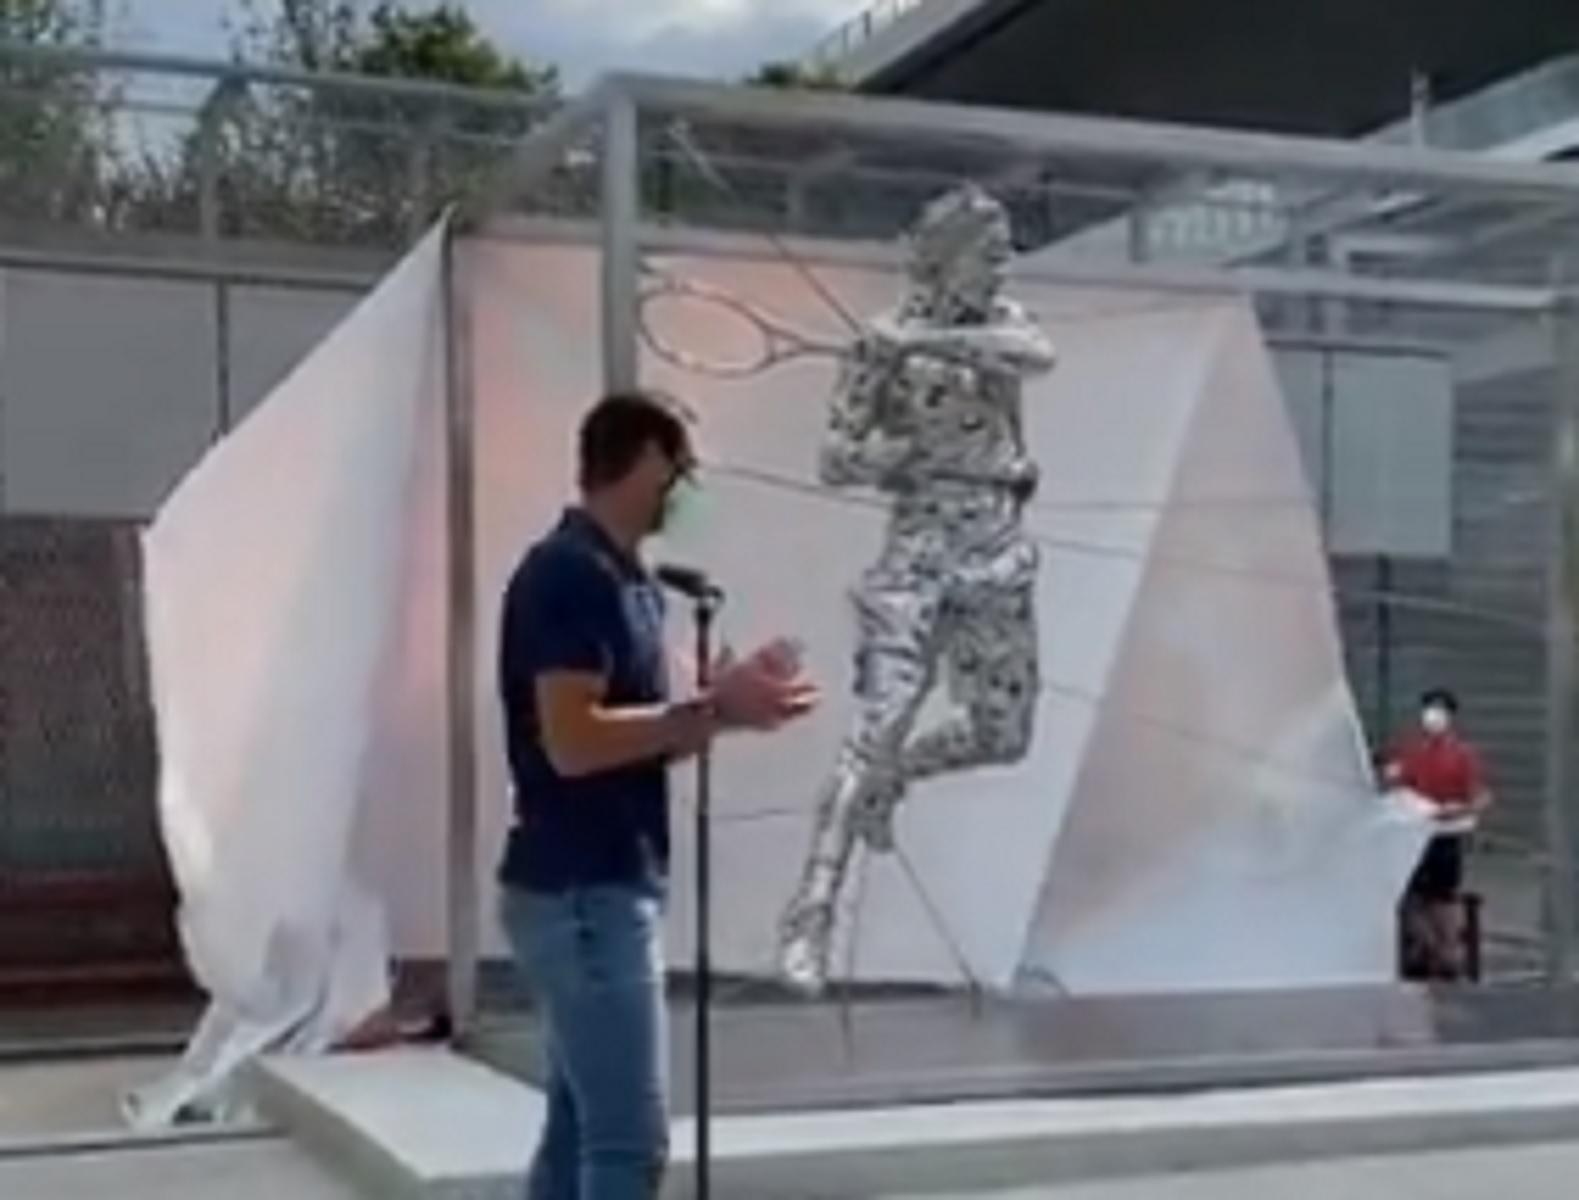 Roland Garros: Ο Ράφα Ναδάλ έγινε άγαλμα στο Παρίσι